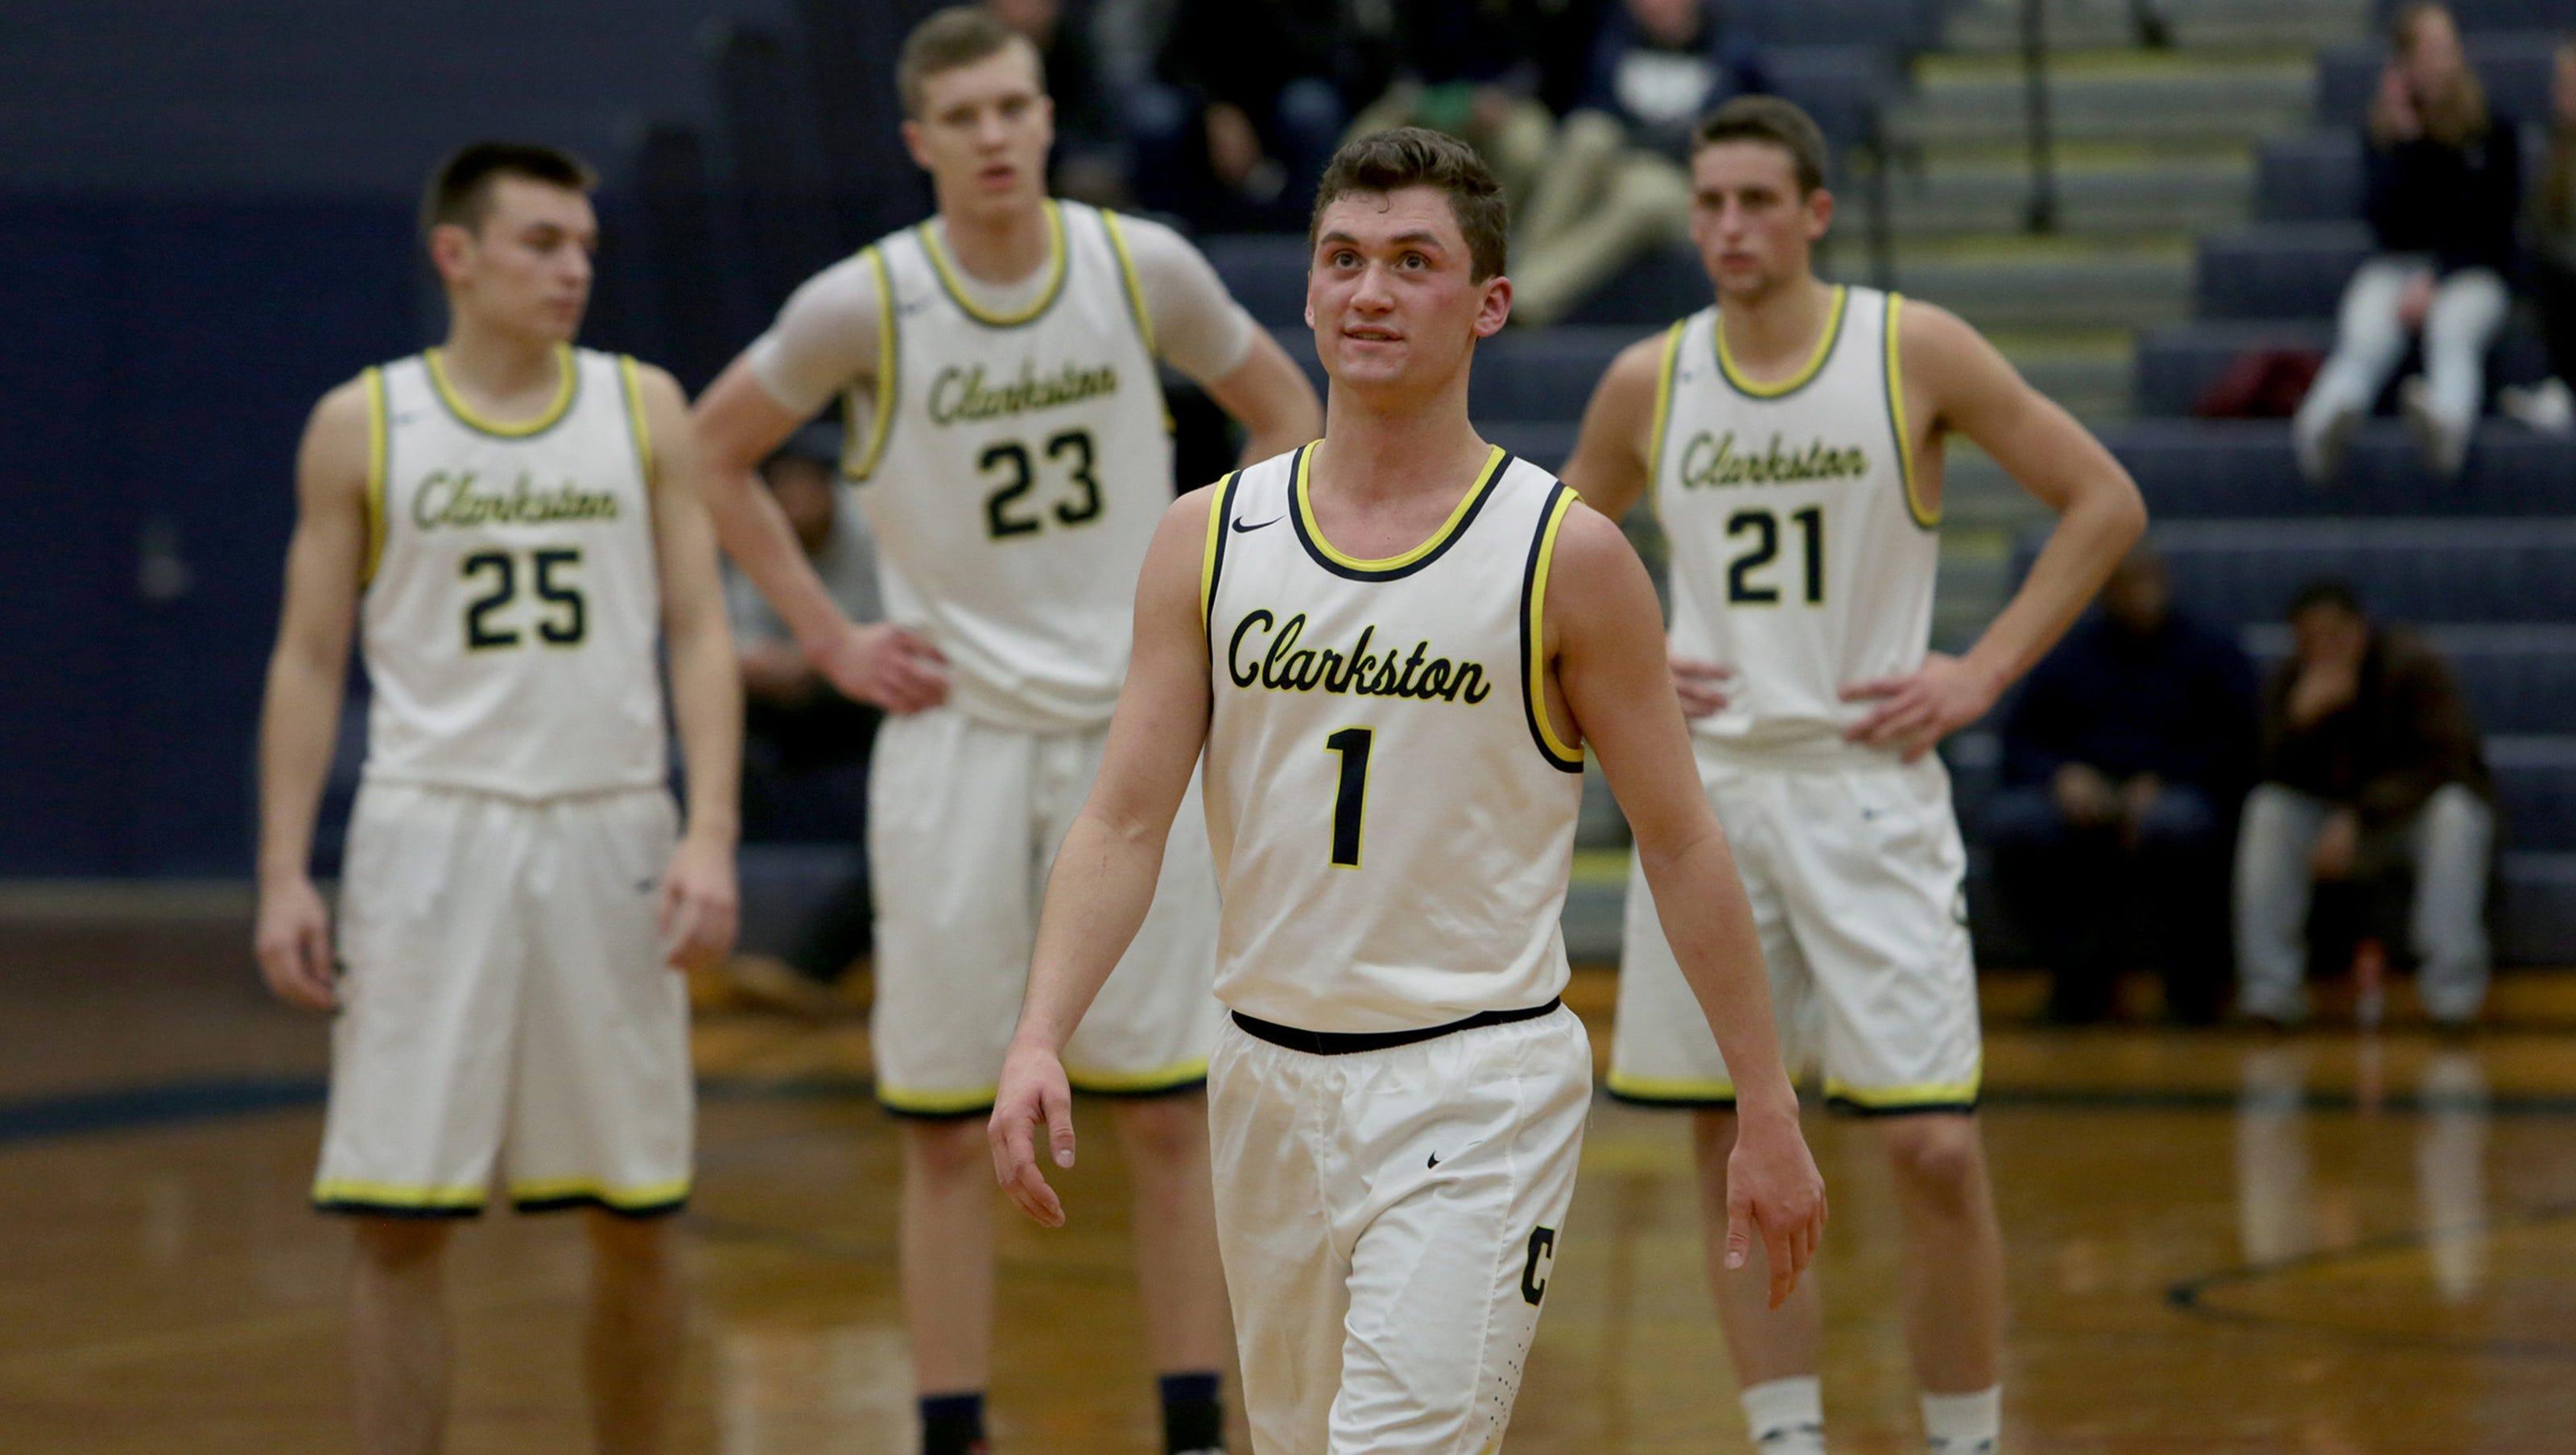 Michigan High School Basketball Rankings For Boys Girls